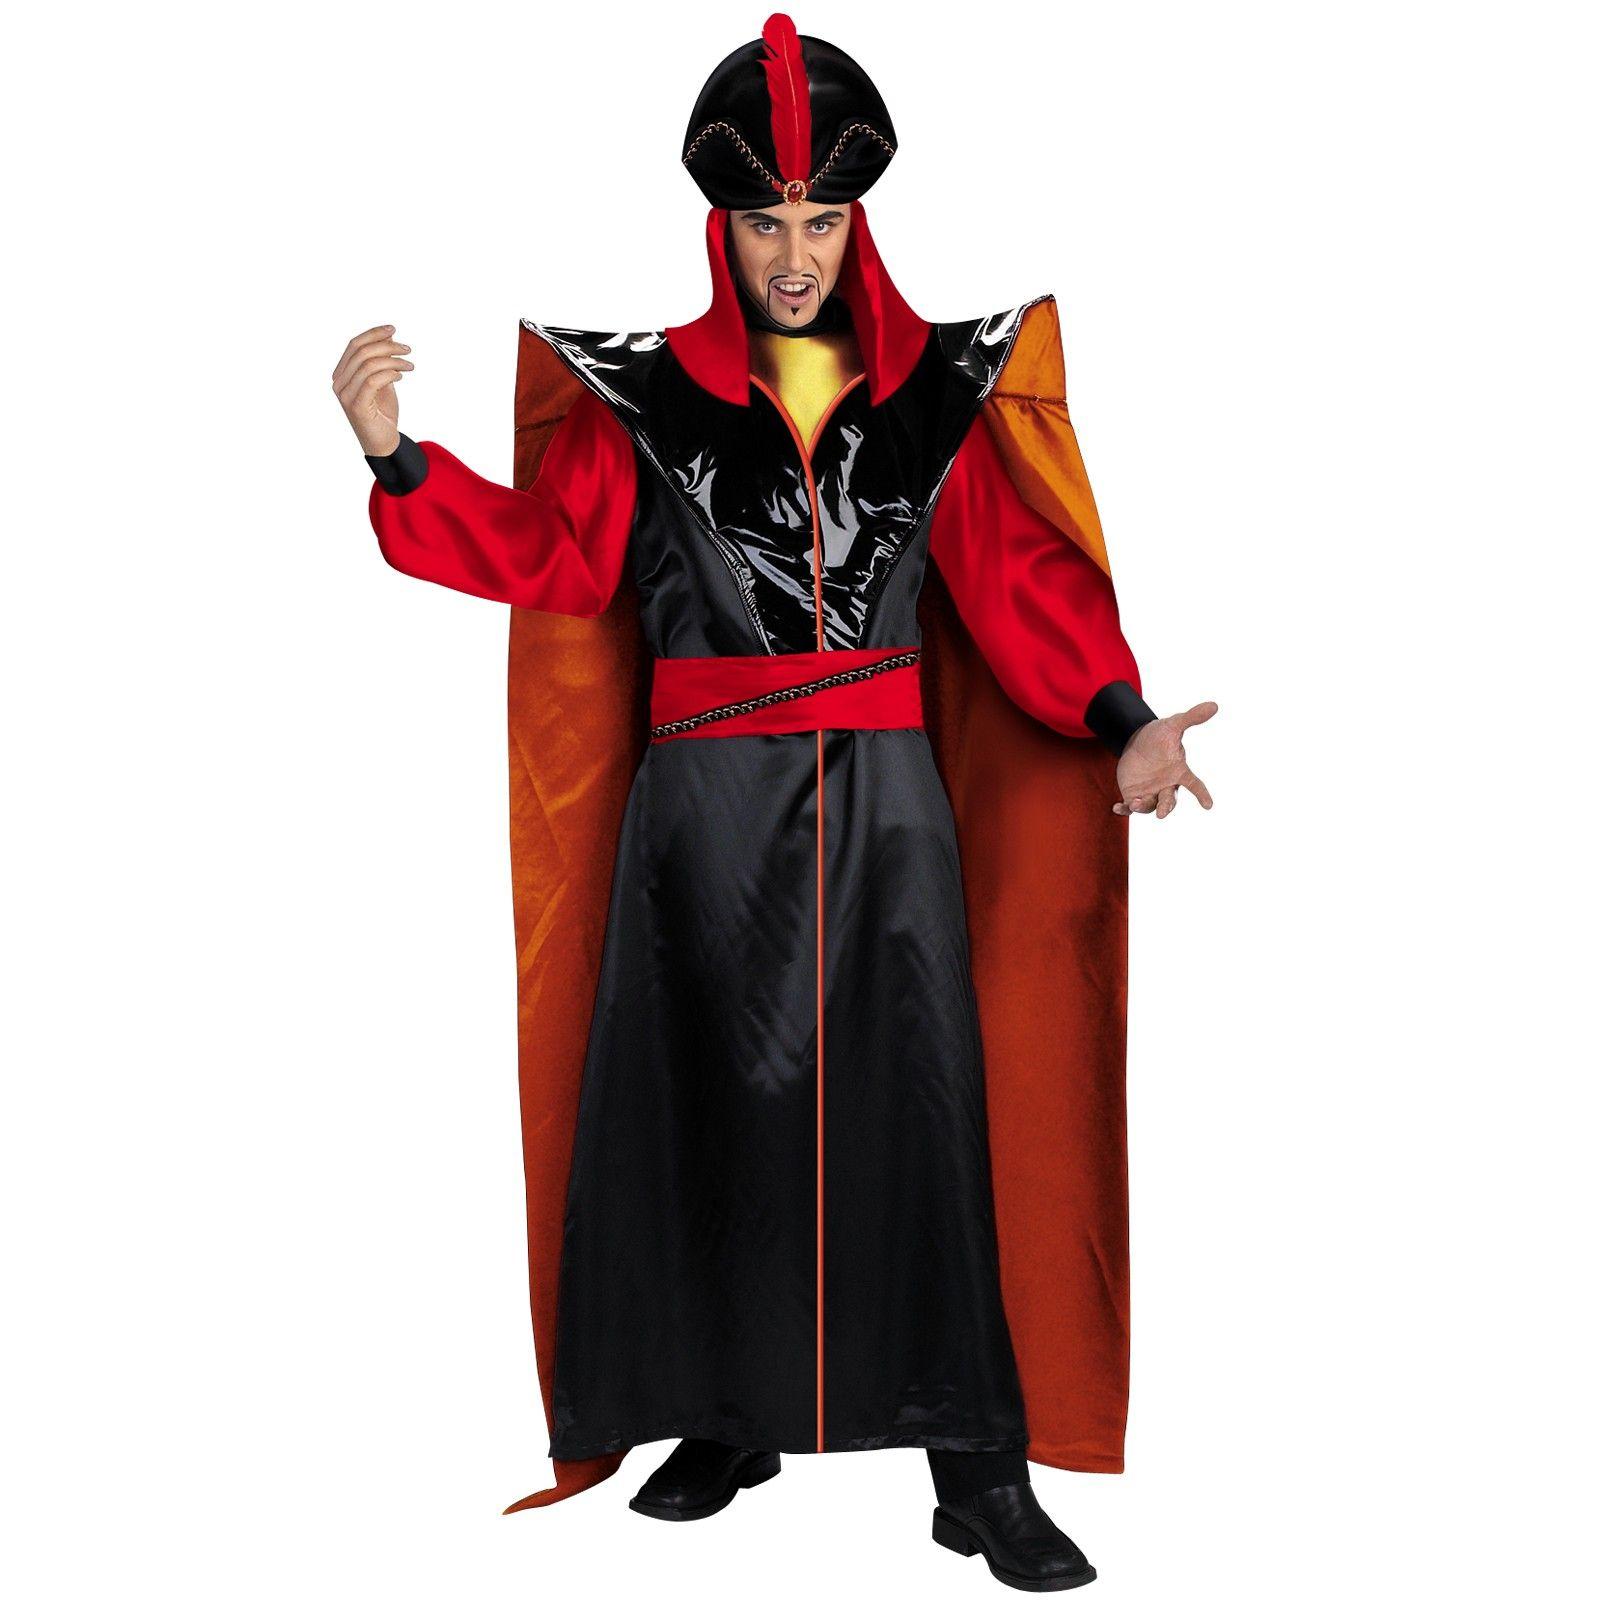 Jafar Prestige Adult Costume  sc 1 st  Pinterest & Disney - Jafar Hat Adult | Costumes Halloween 2013 and Halloween ...